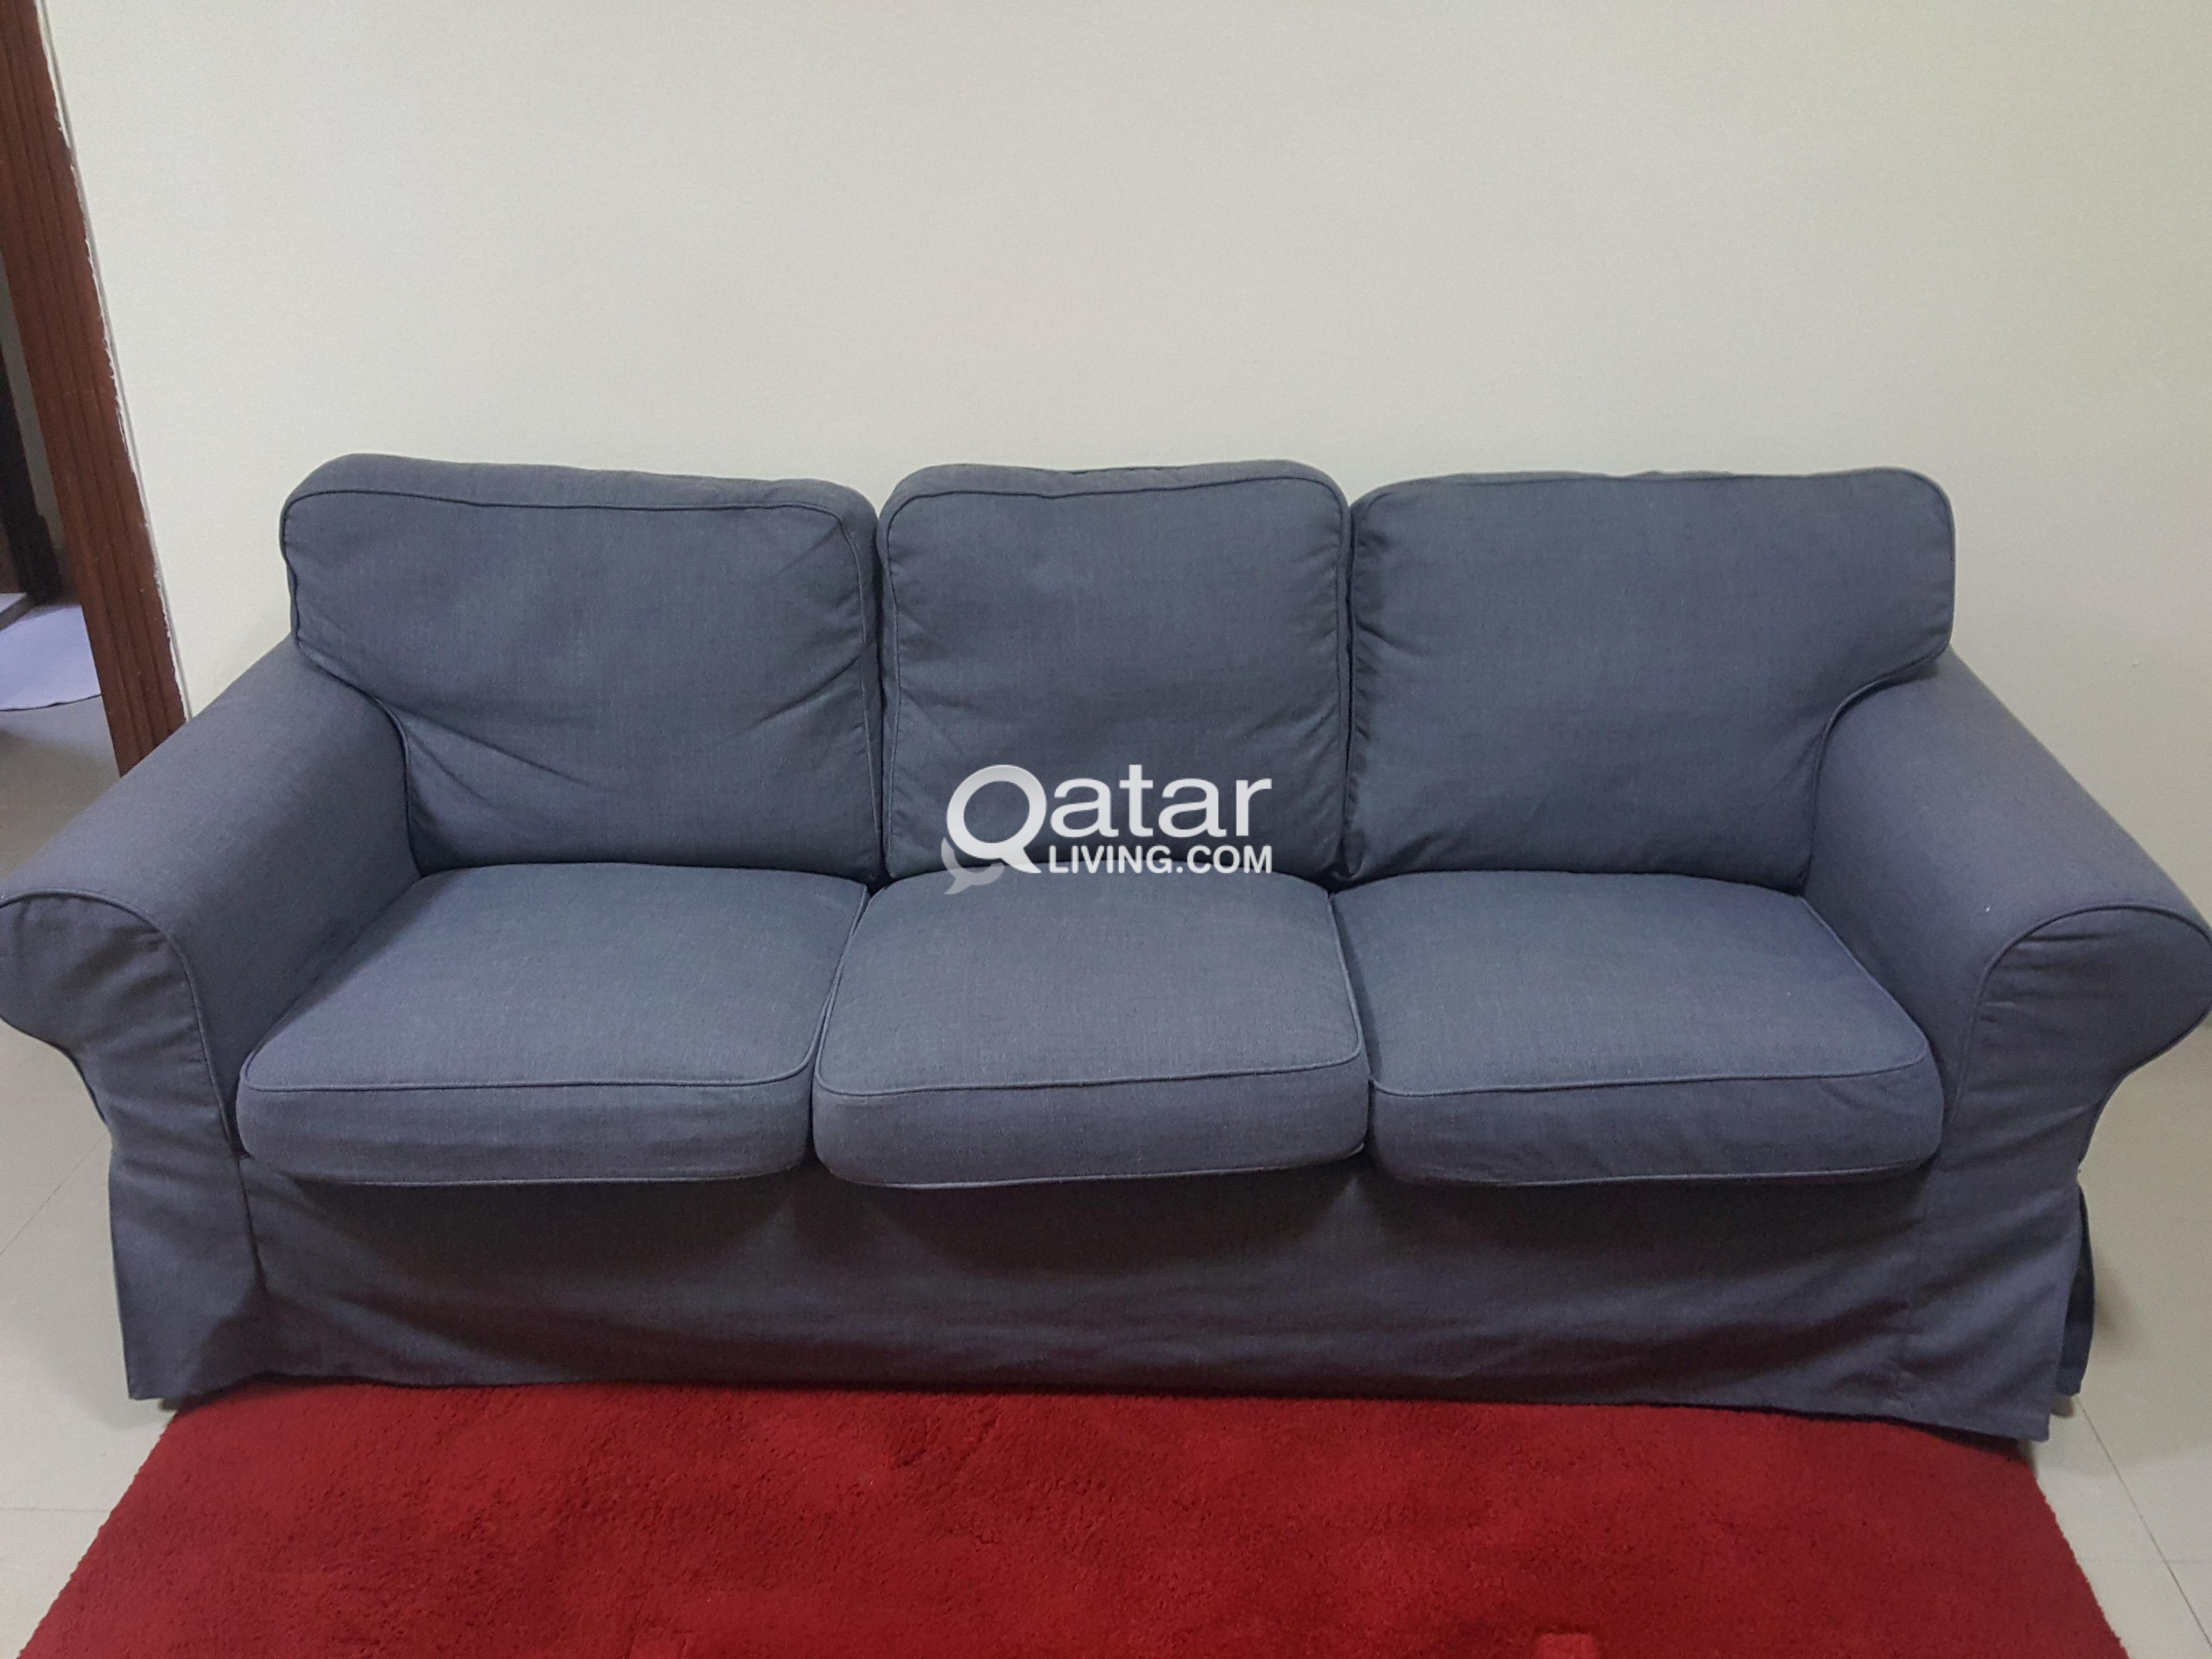 3 Seater Comfy Sofa Ikea Qatar Living